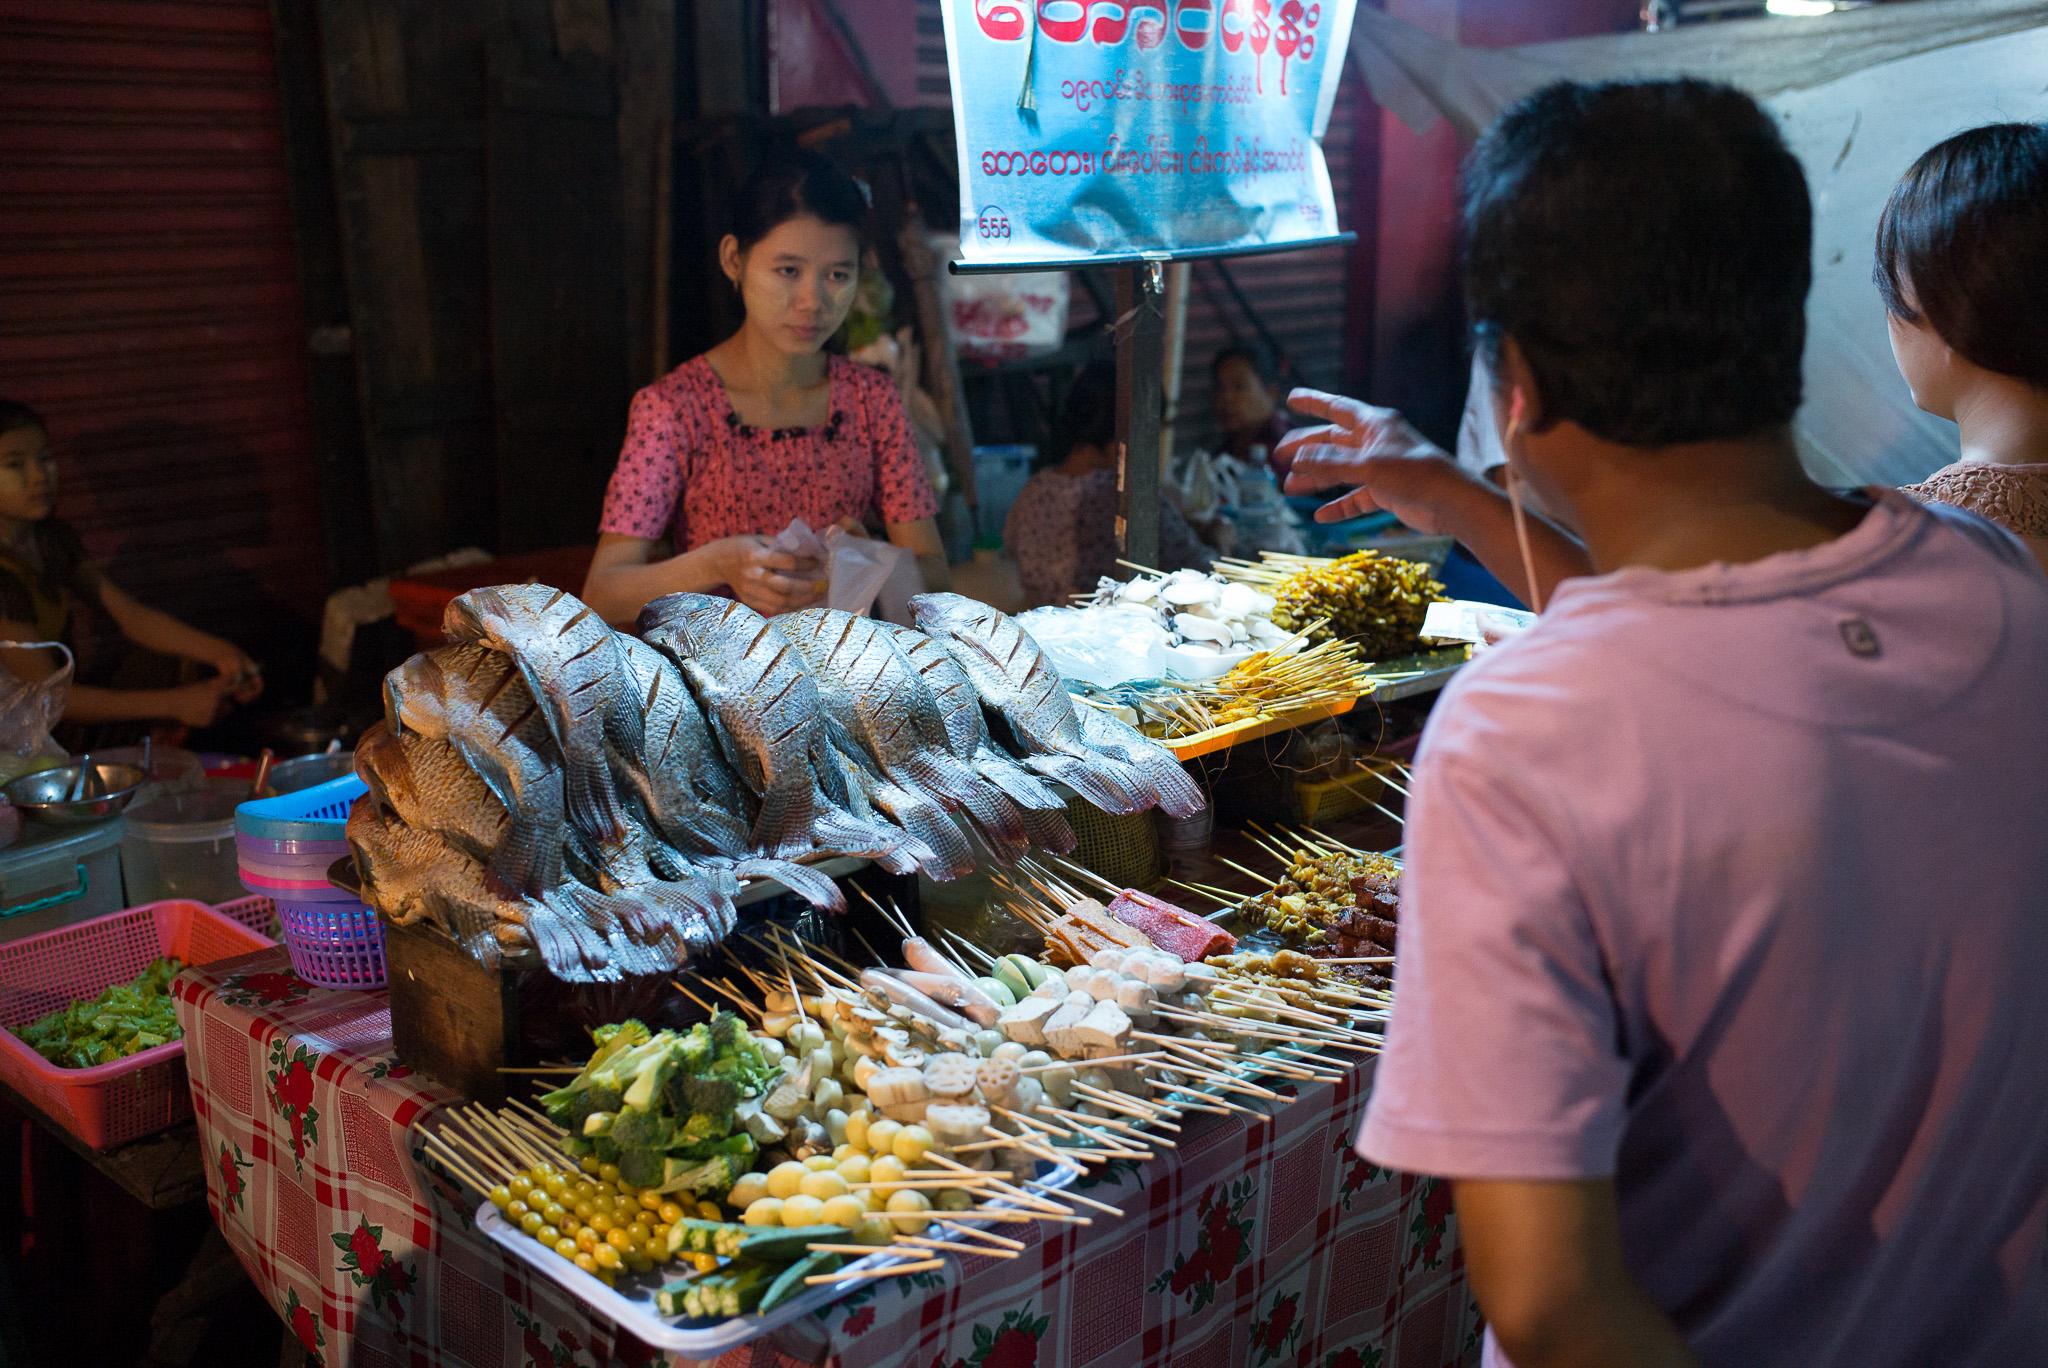 16-Burma-0018-P-1412.jpg